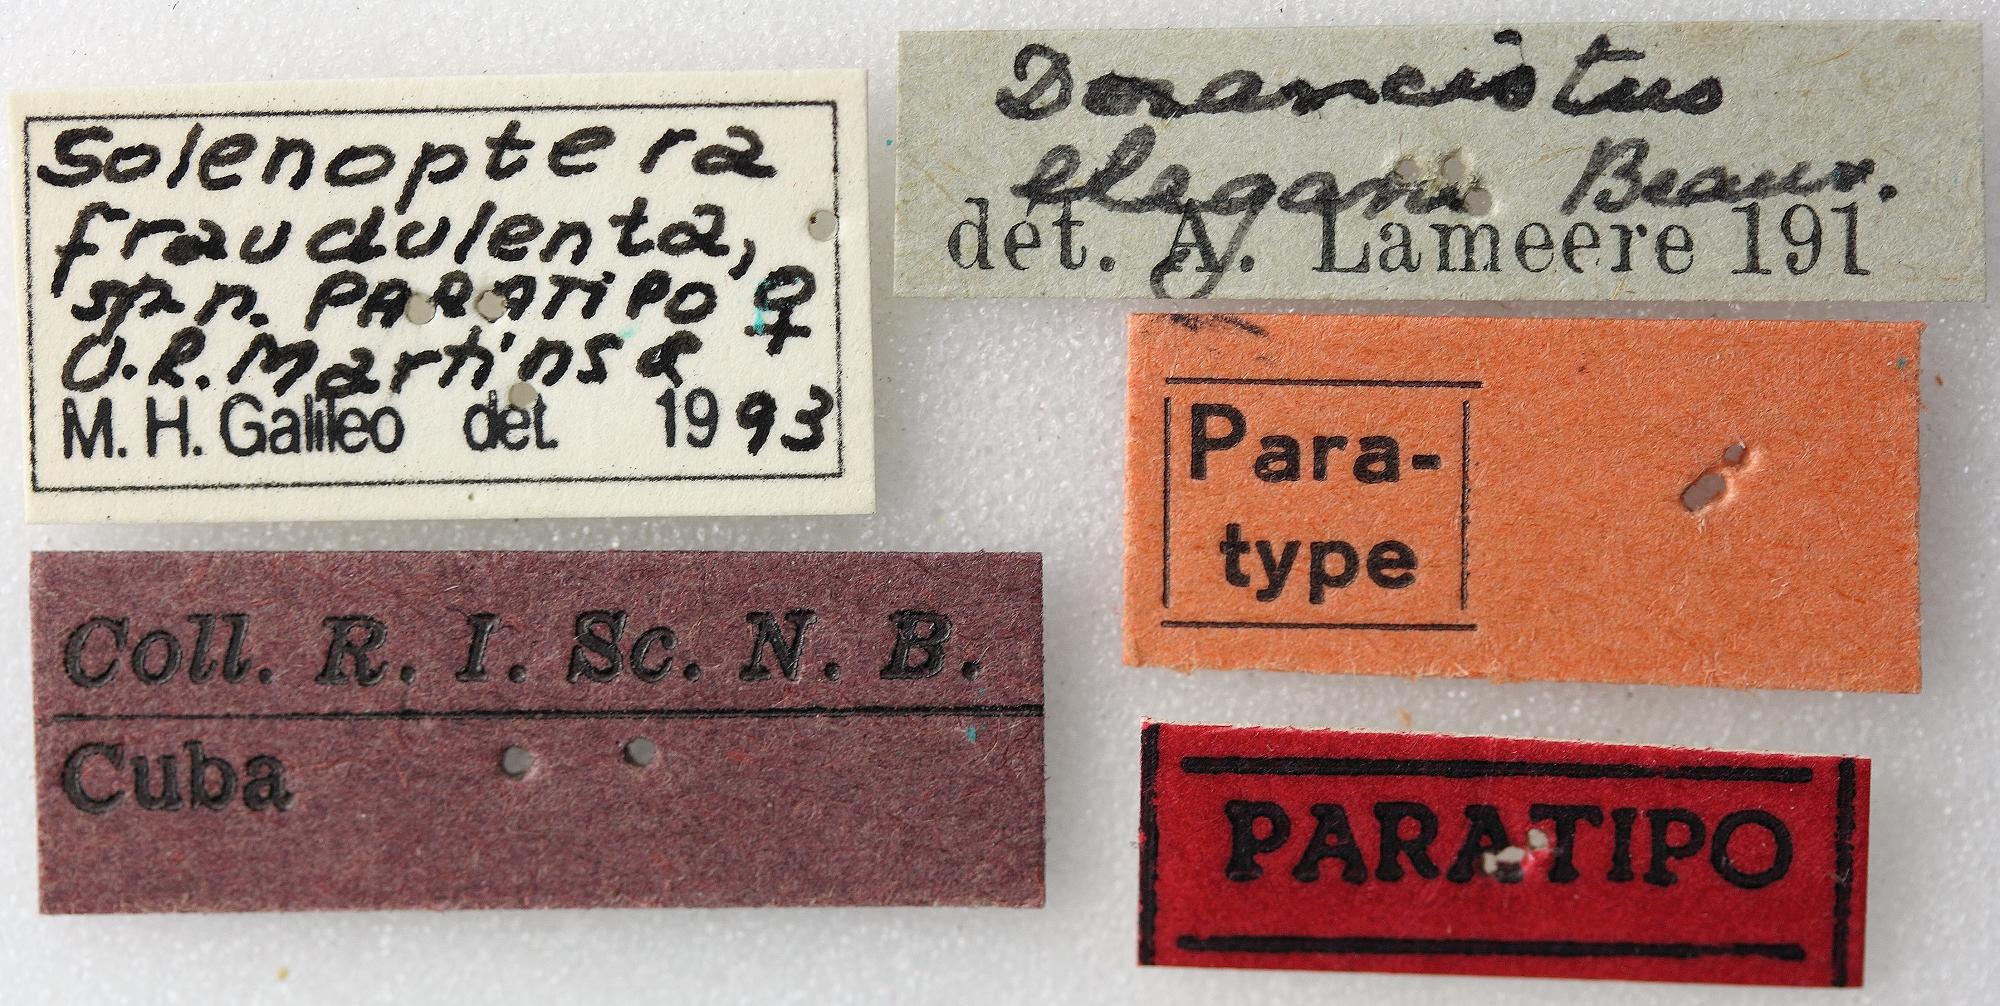 Solenoptera fraudulenta 03 00 Paratype F 022 BRUS 201405.jpg